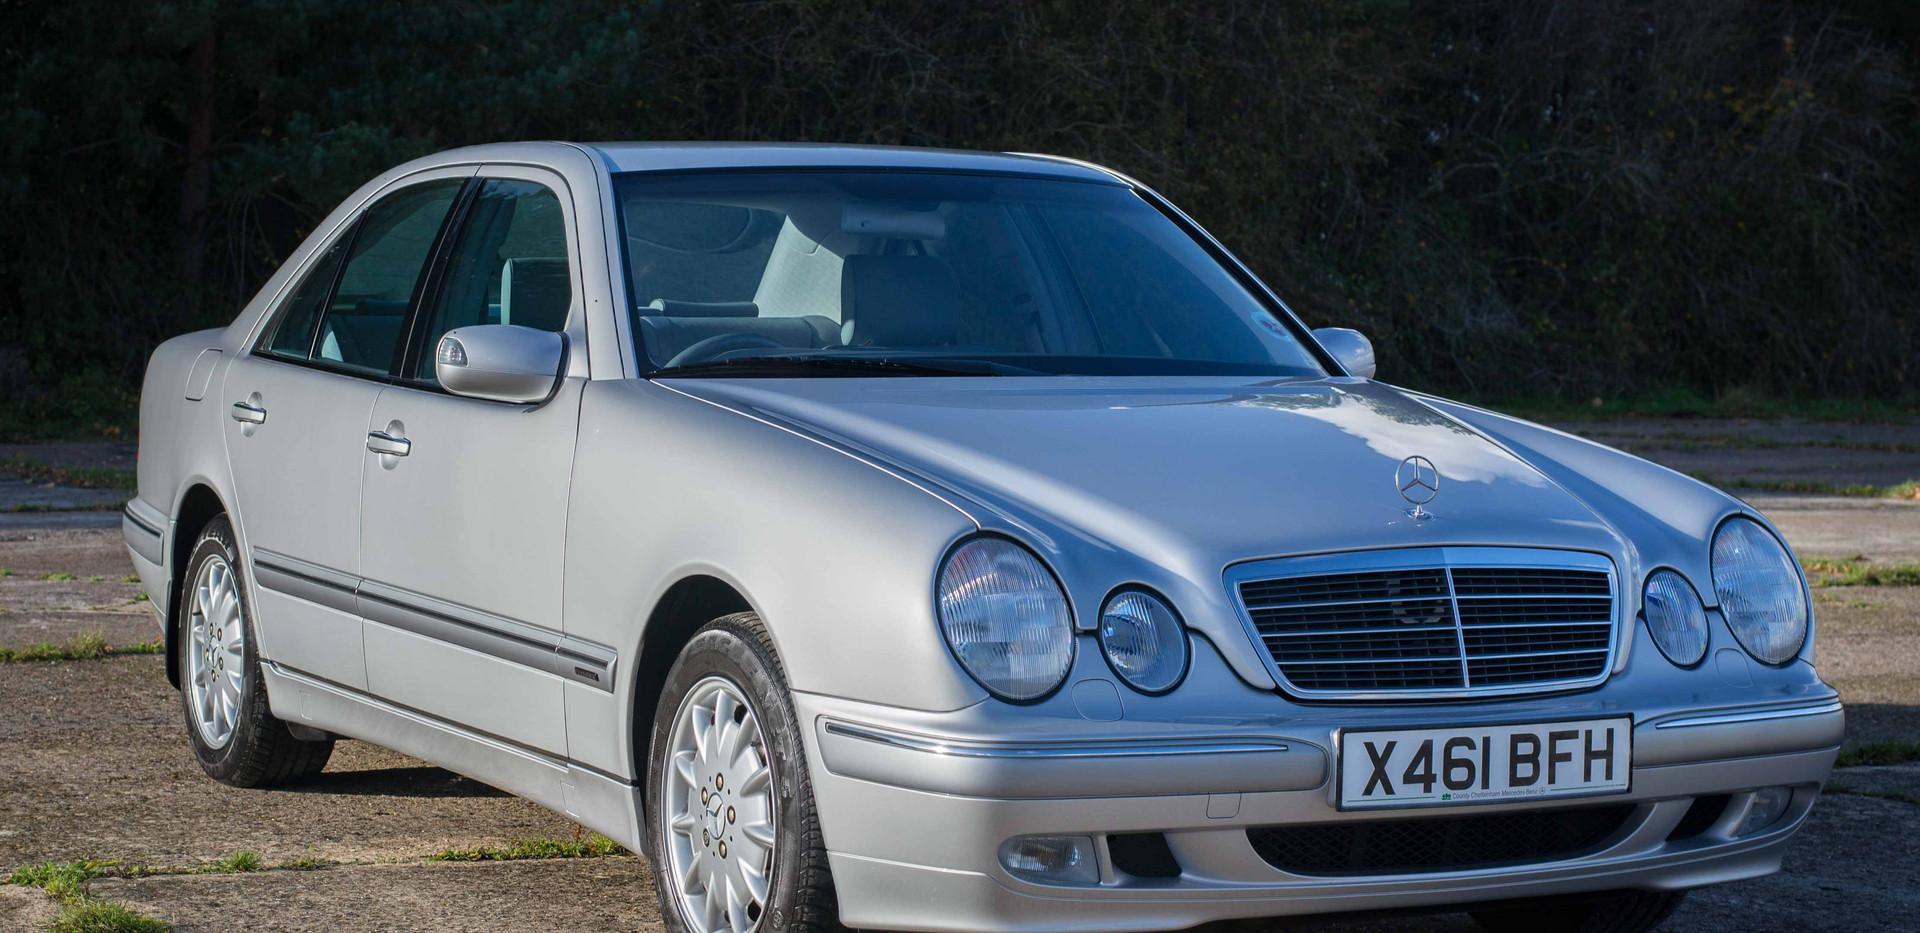 Mercedes E240 For Sale UK London  (27 of